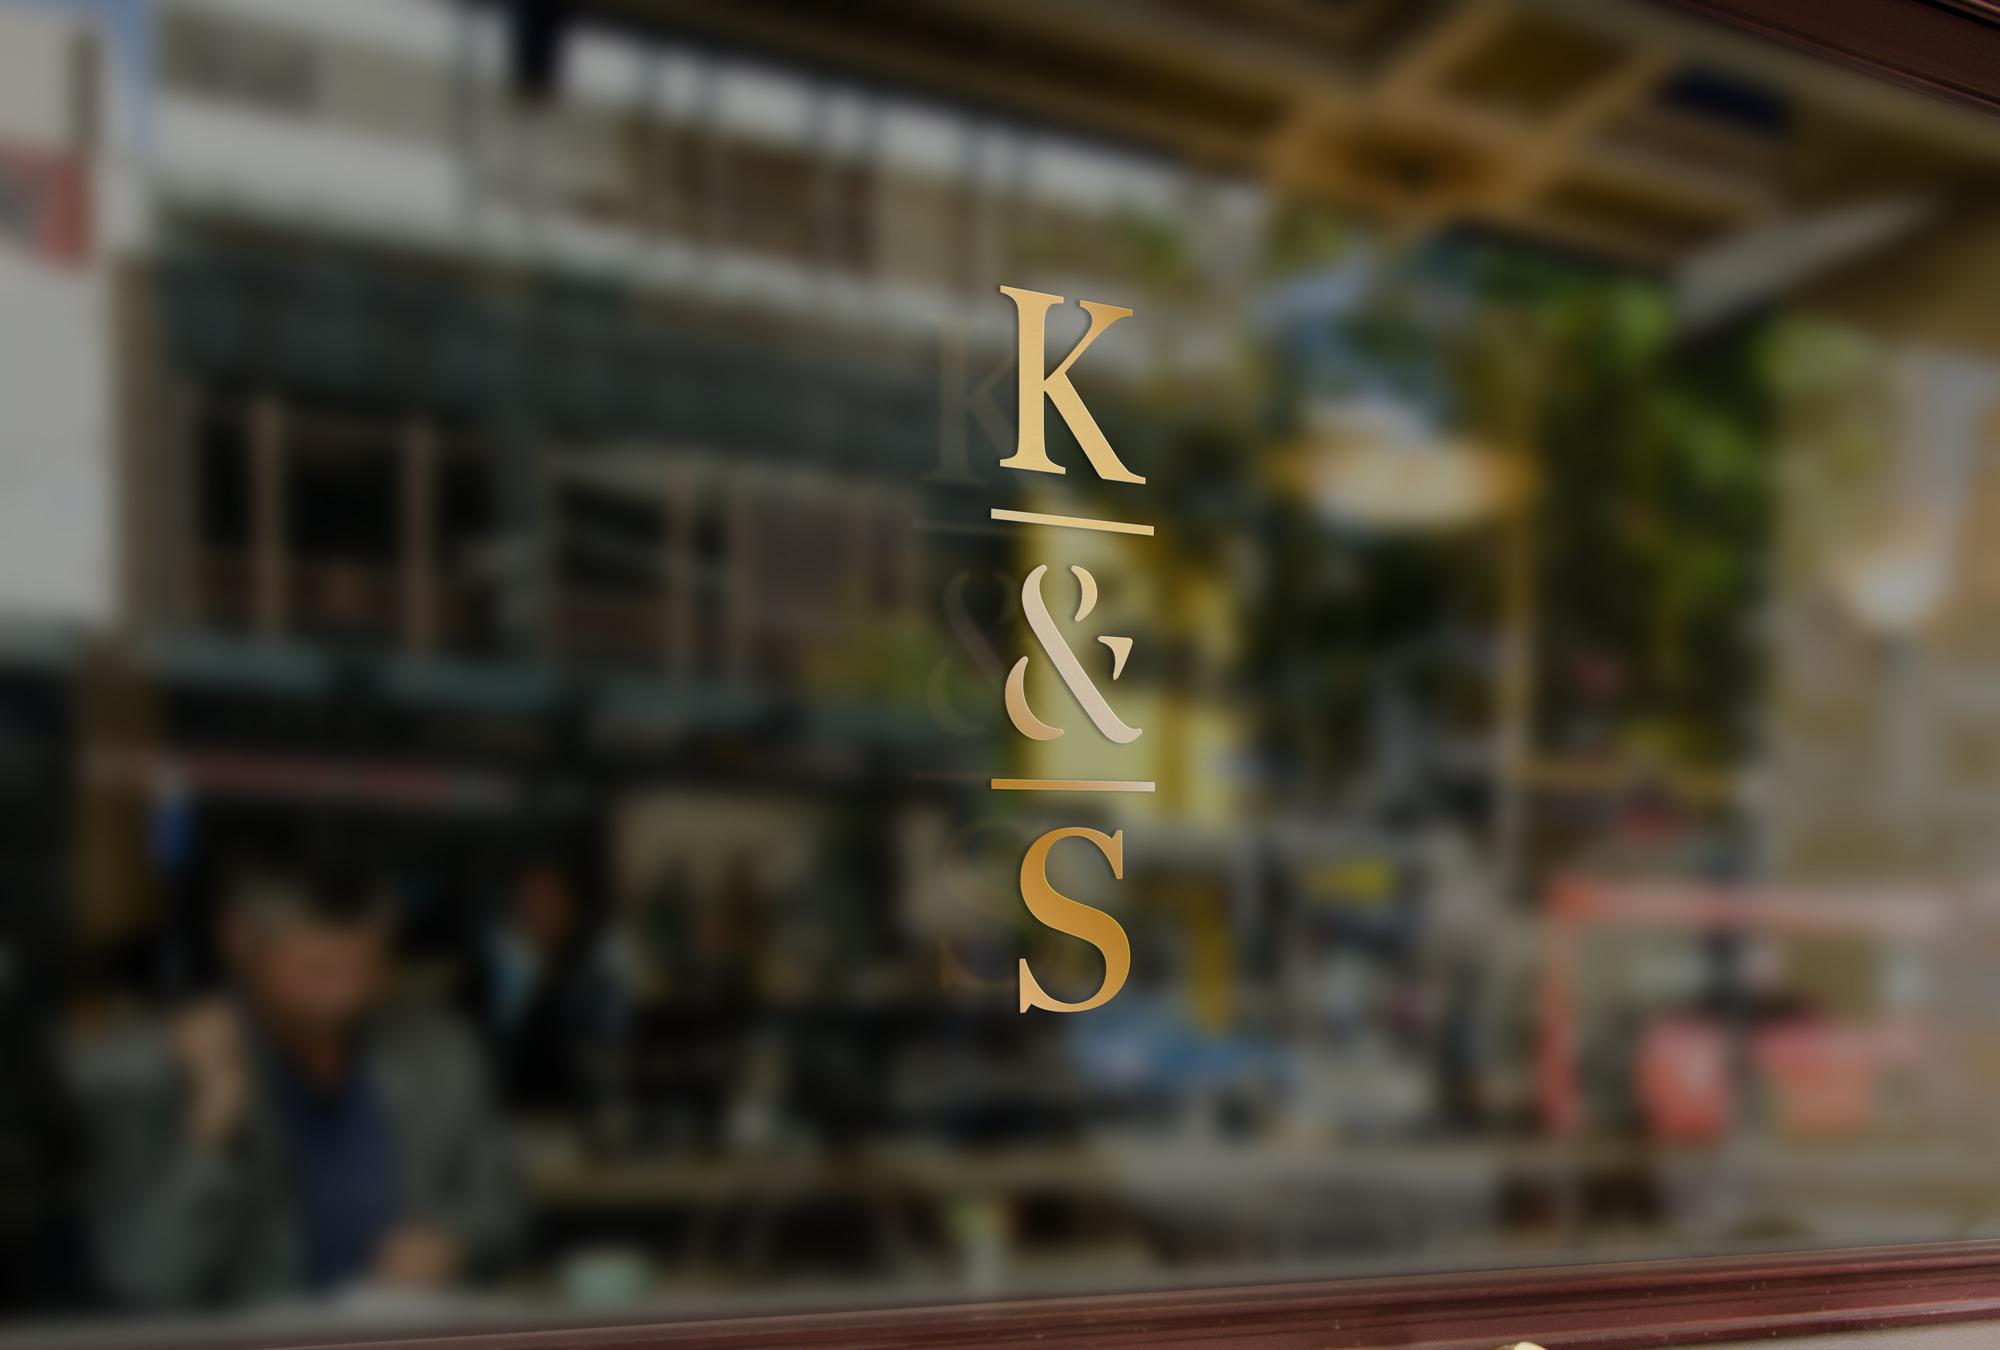 K&S_Window-Signage.jpg